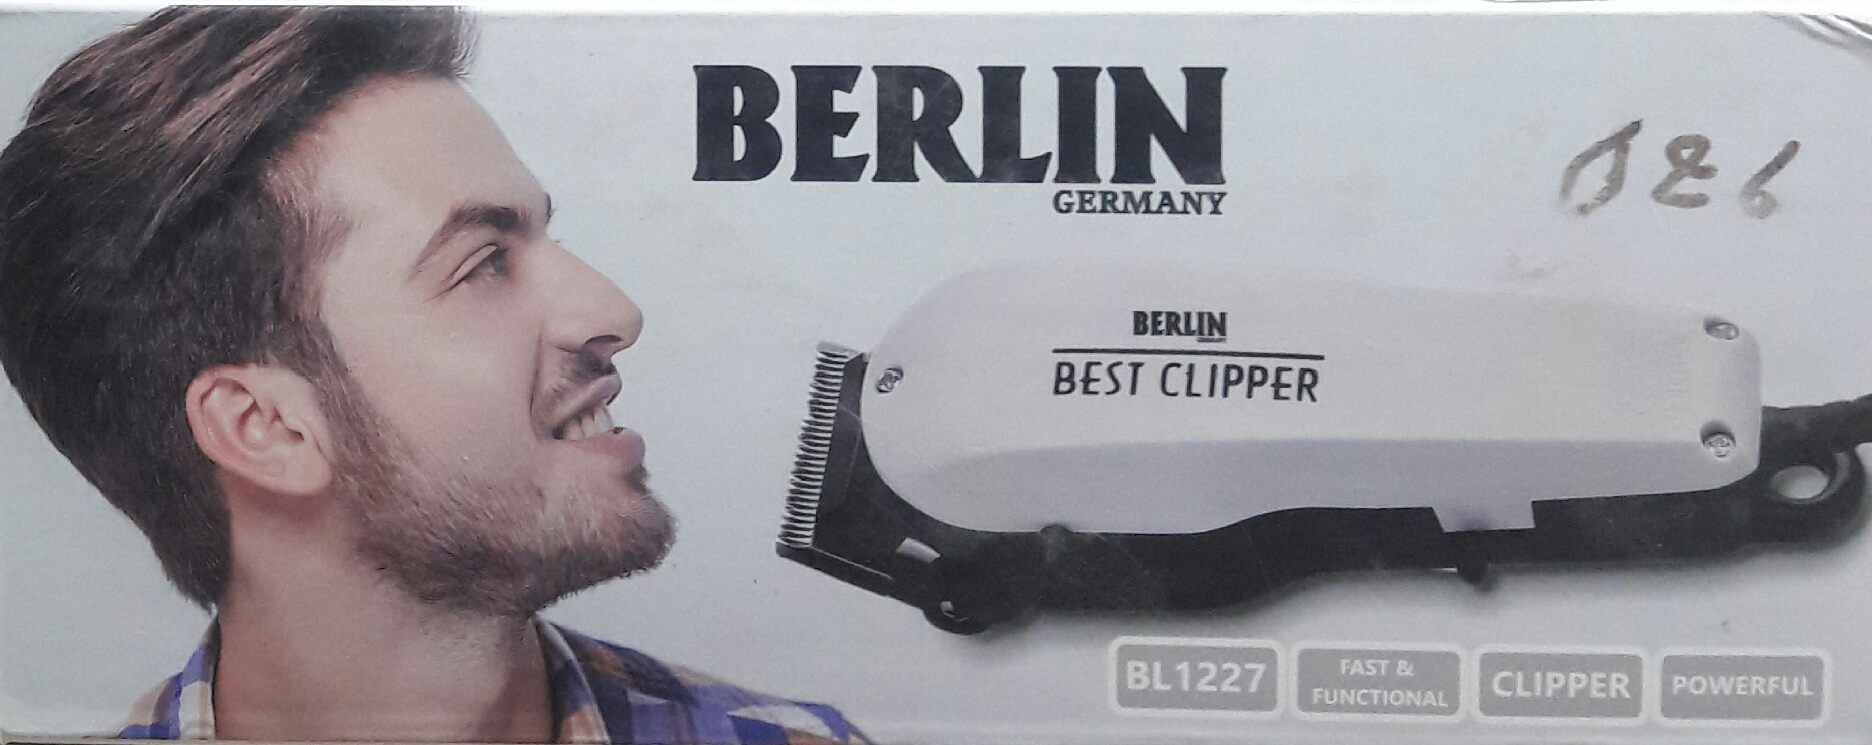 ریش تراش برلین